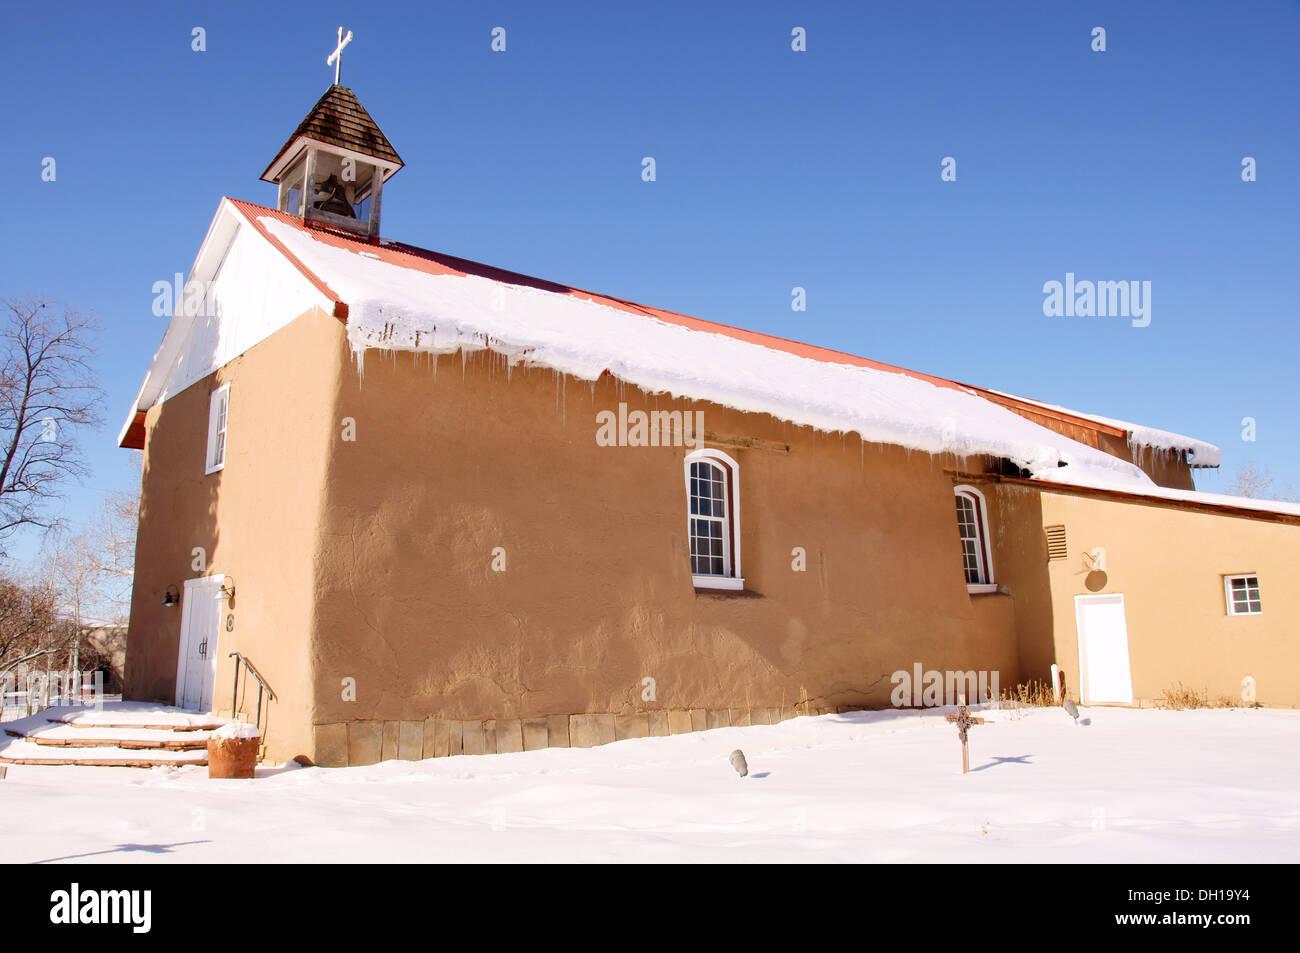 La Santisima Trinidad Parish Arroyo Seco NM Holy Trinity catholic church at arroyo seco new mexico nm winter - Stock Image